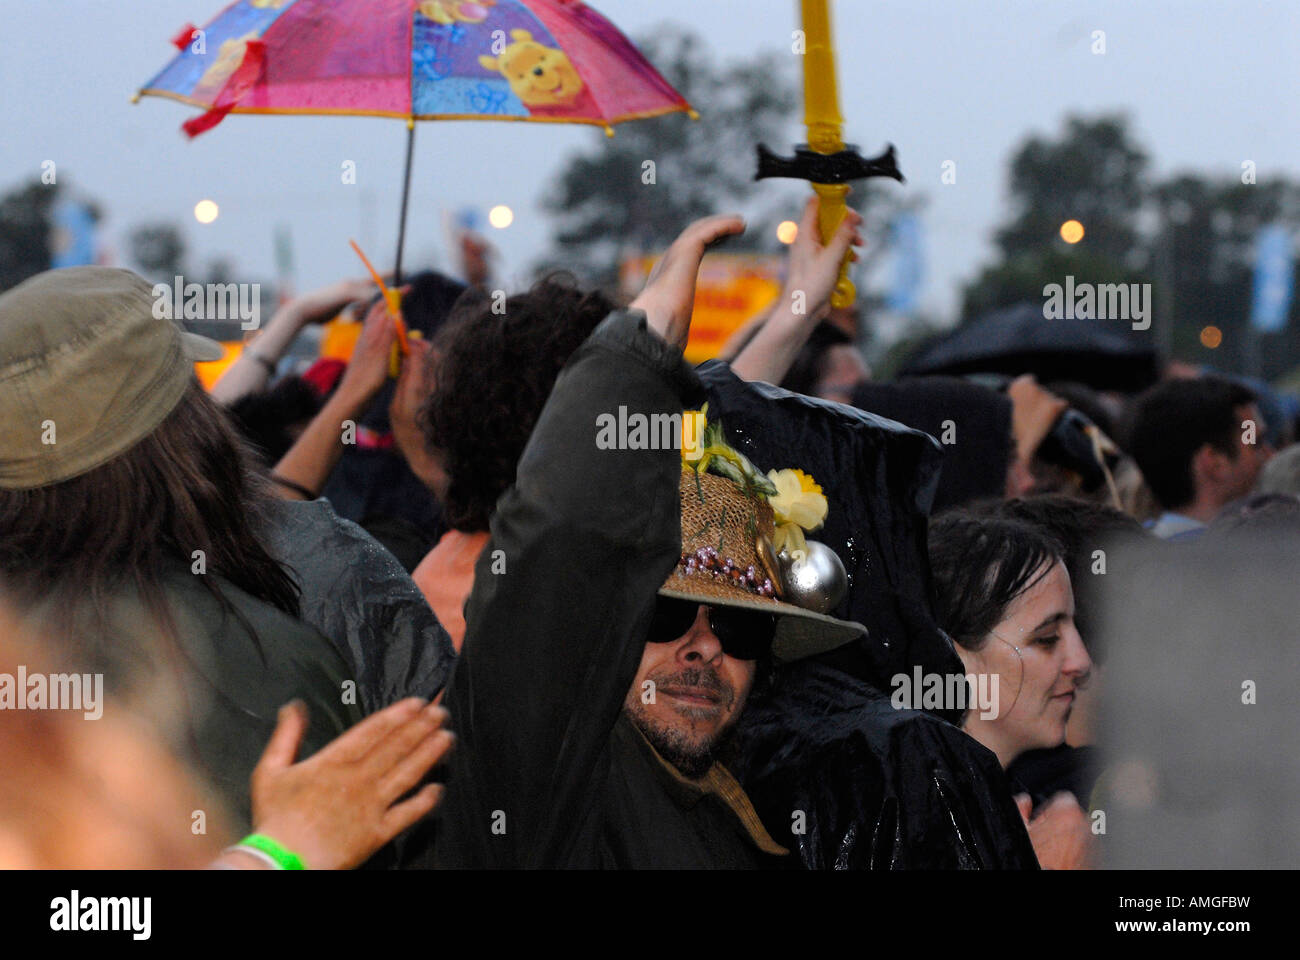 pic martin phelps 26 07 07 reporter gordon womad festival charlton park malmesbury third night saturday Stock Photo